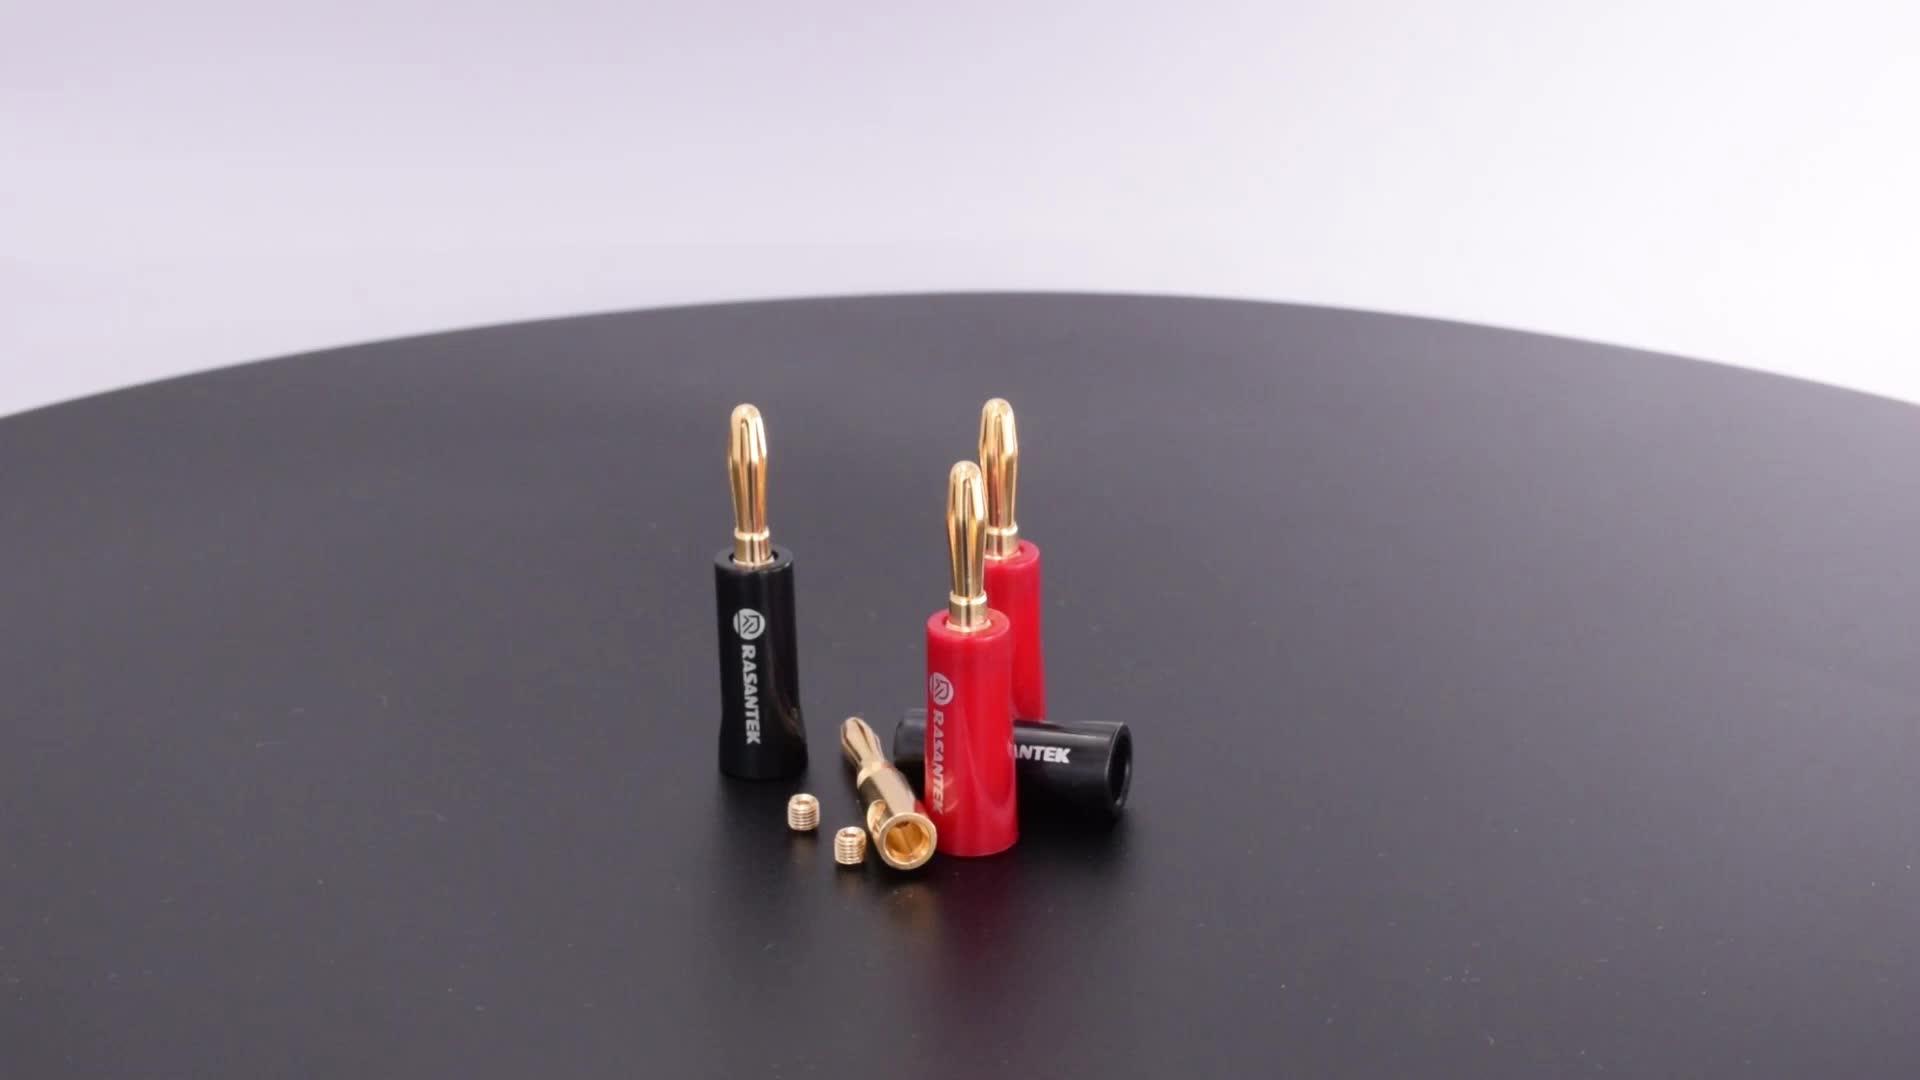 24K gold plated ABS highlight shell 4mm HIFI speaker safety male banana plug